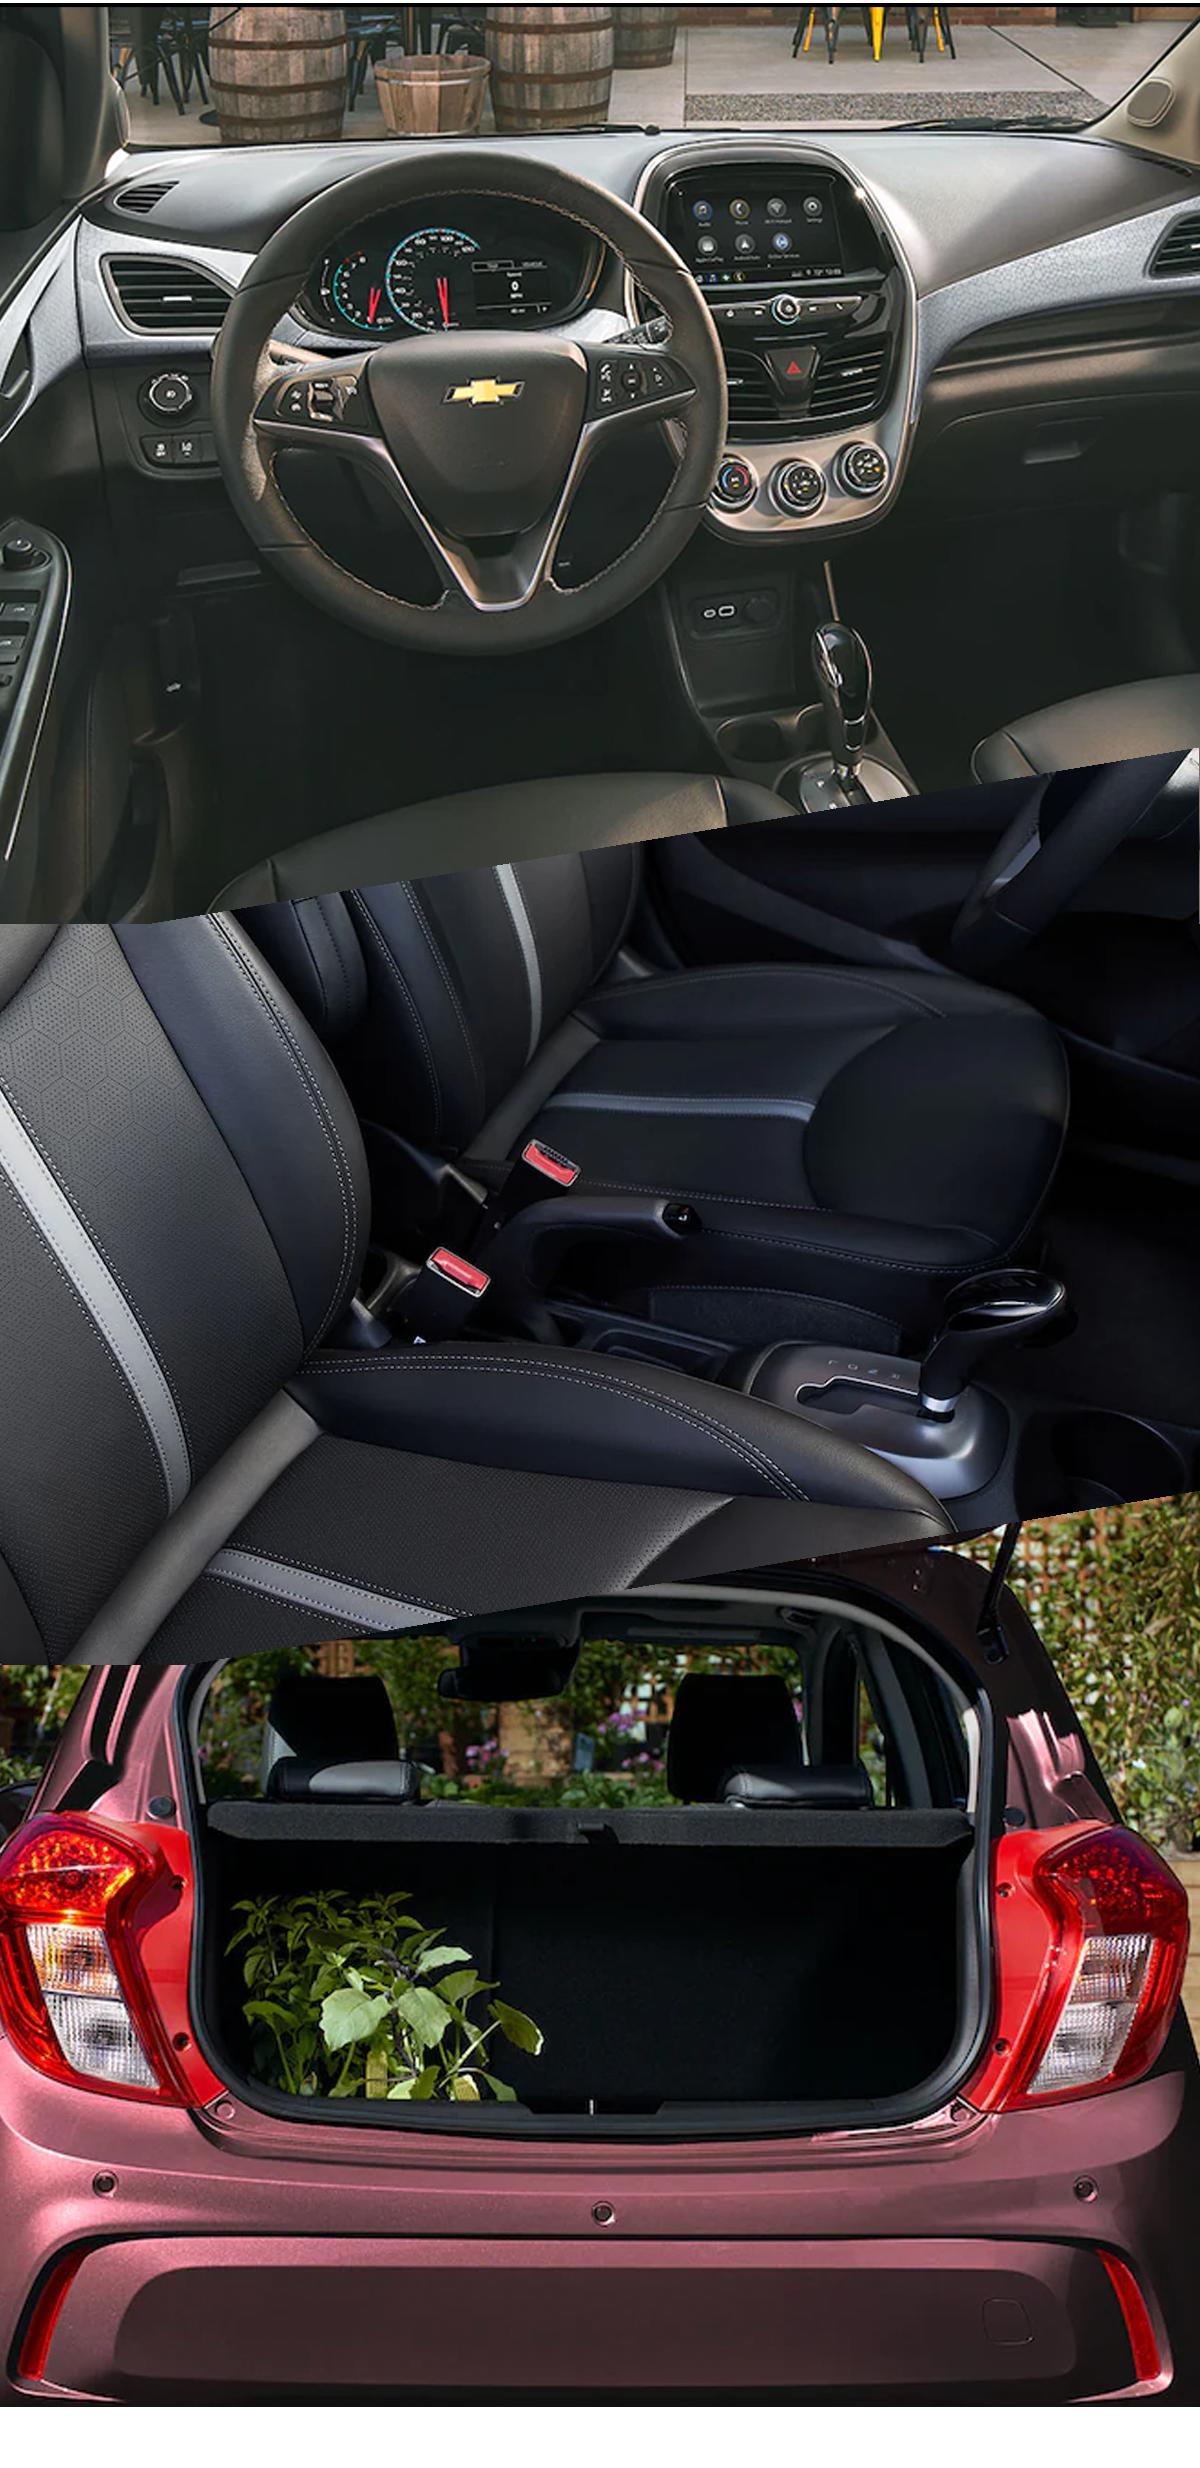 2021 Chevrolet Spark Interior Images in Roanoke, VA